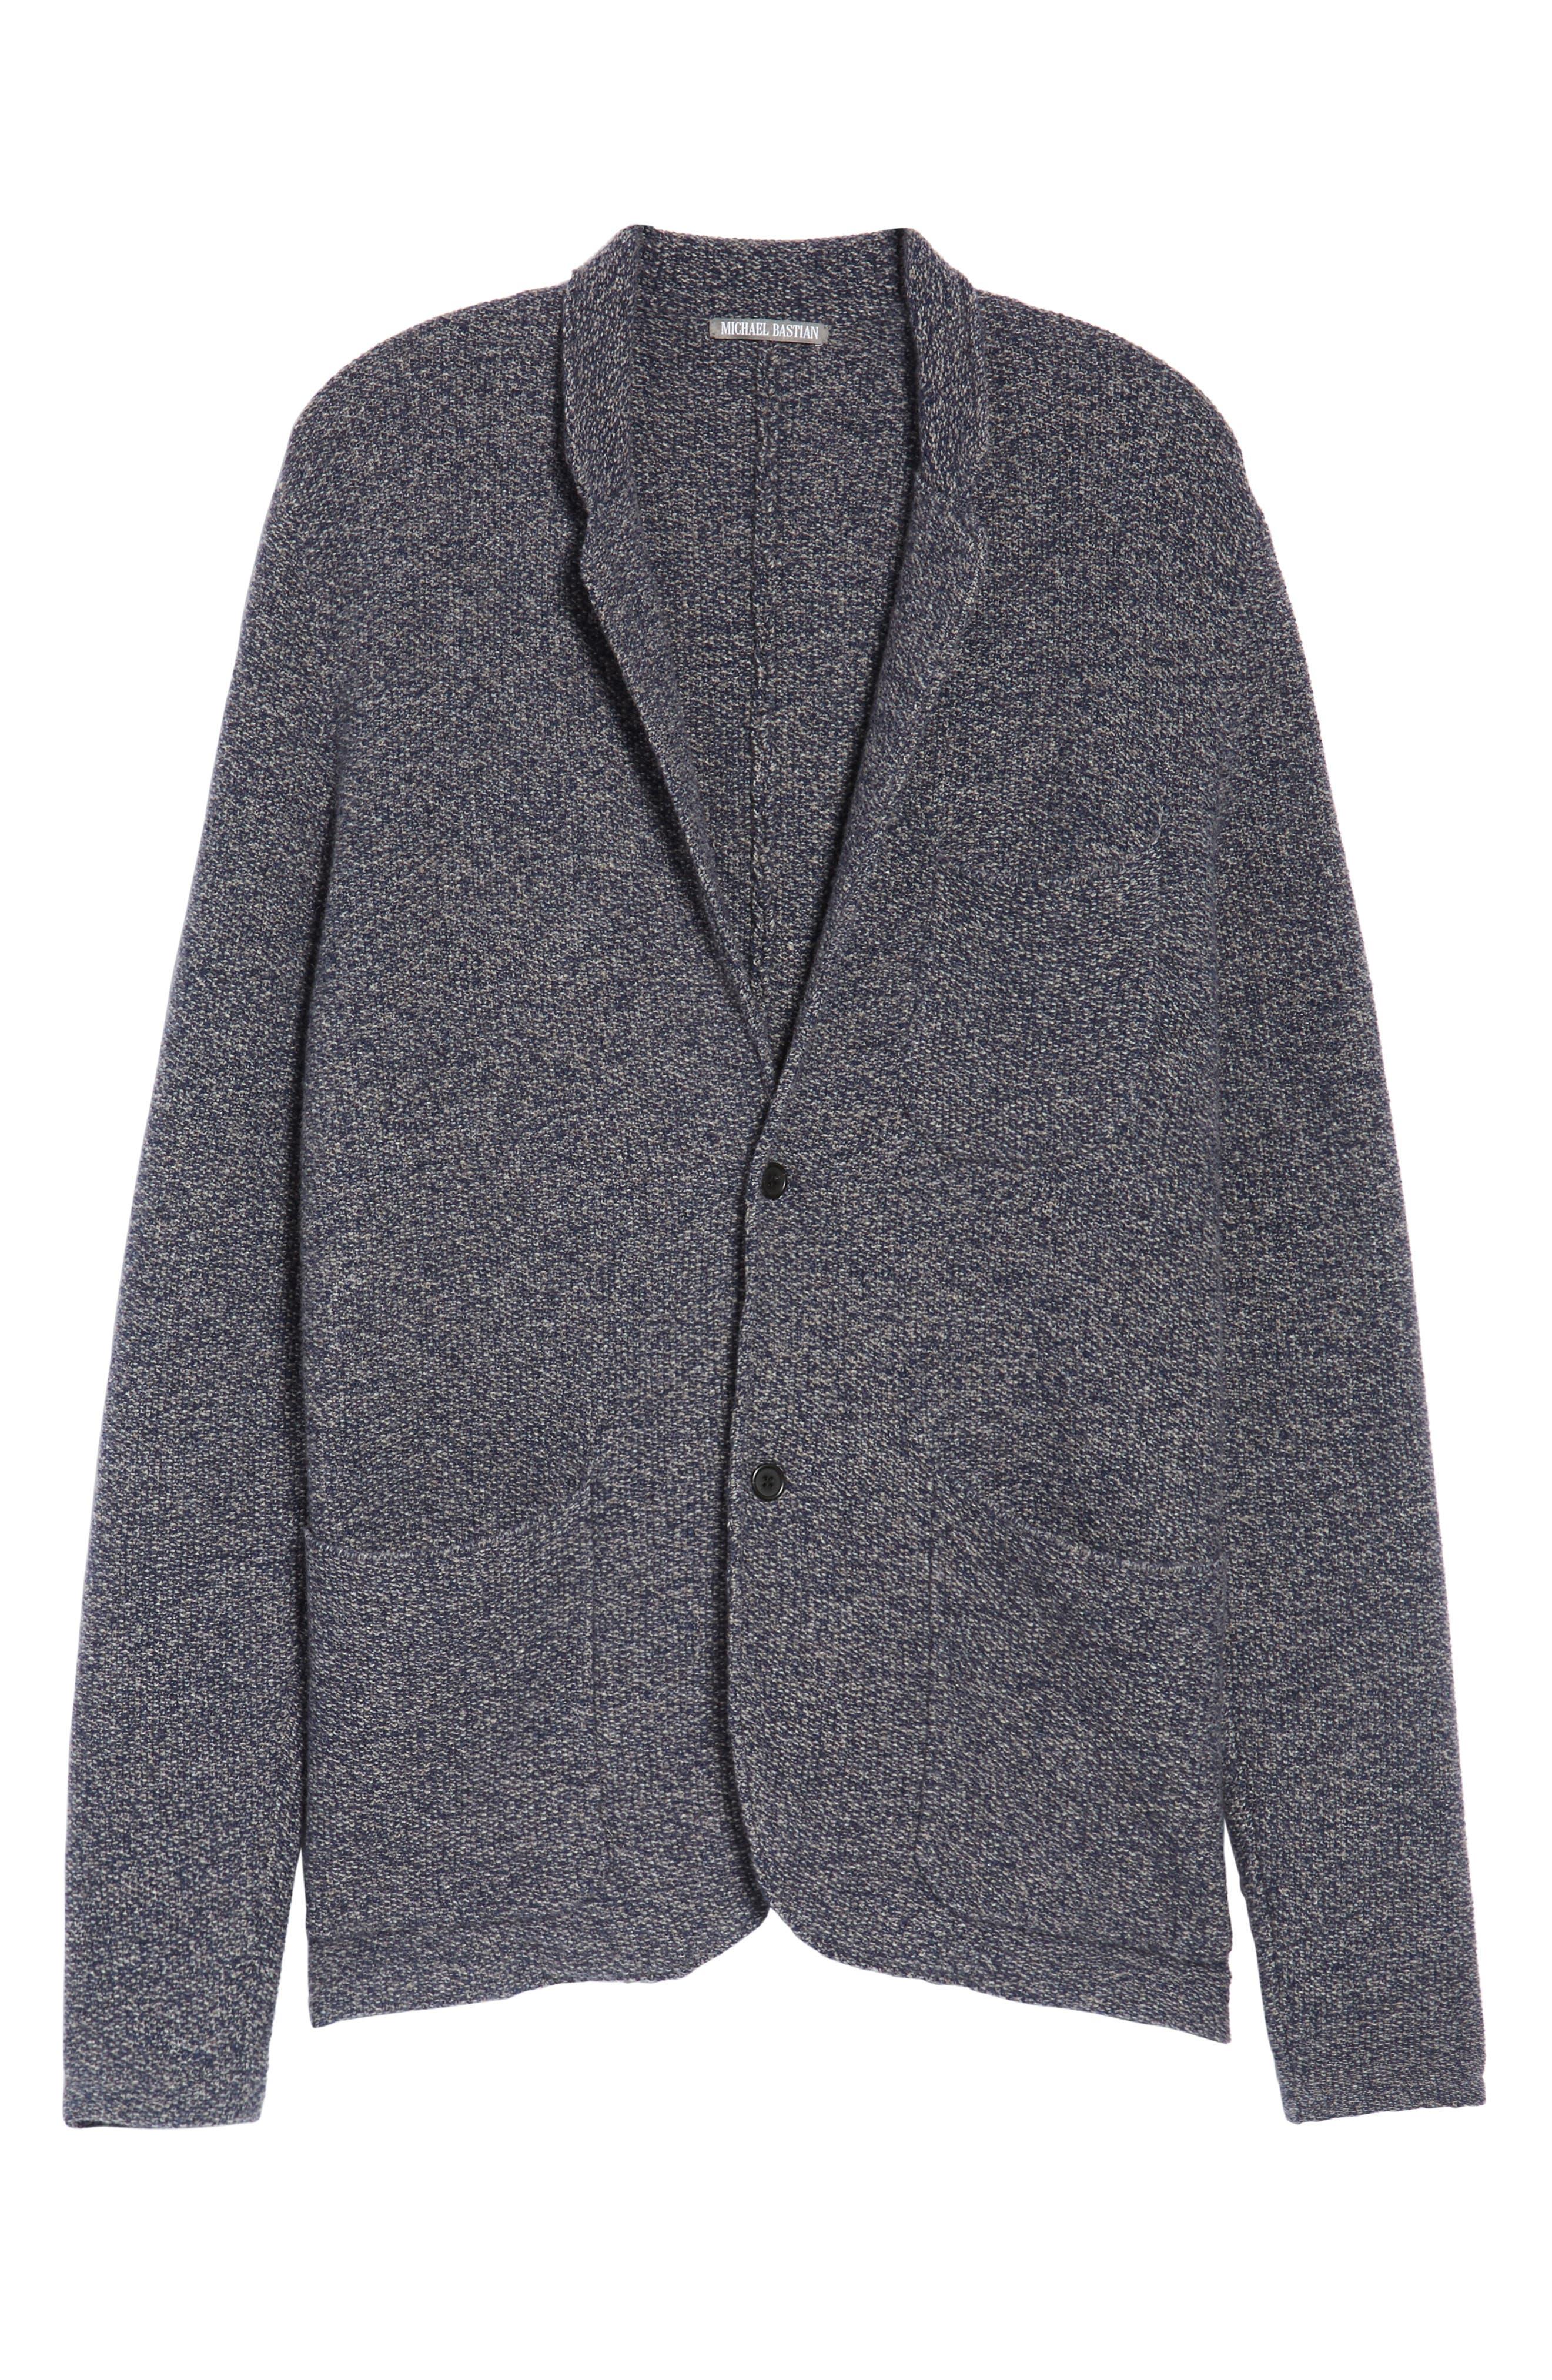 Deconstructed Merino & Yak Wool Sweater Jacket,                             Alternate thumbnail 5, color,                             416